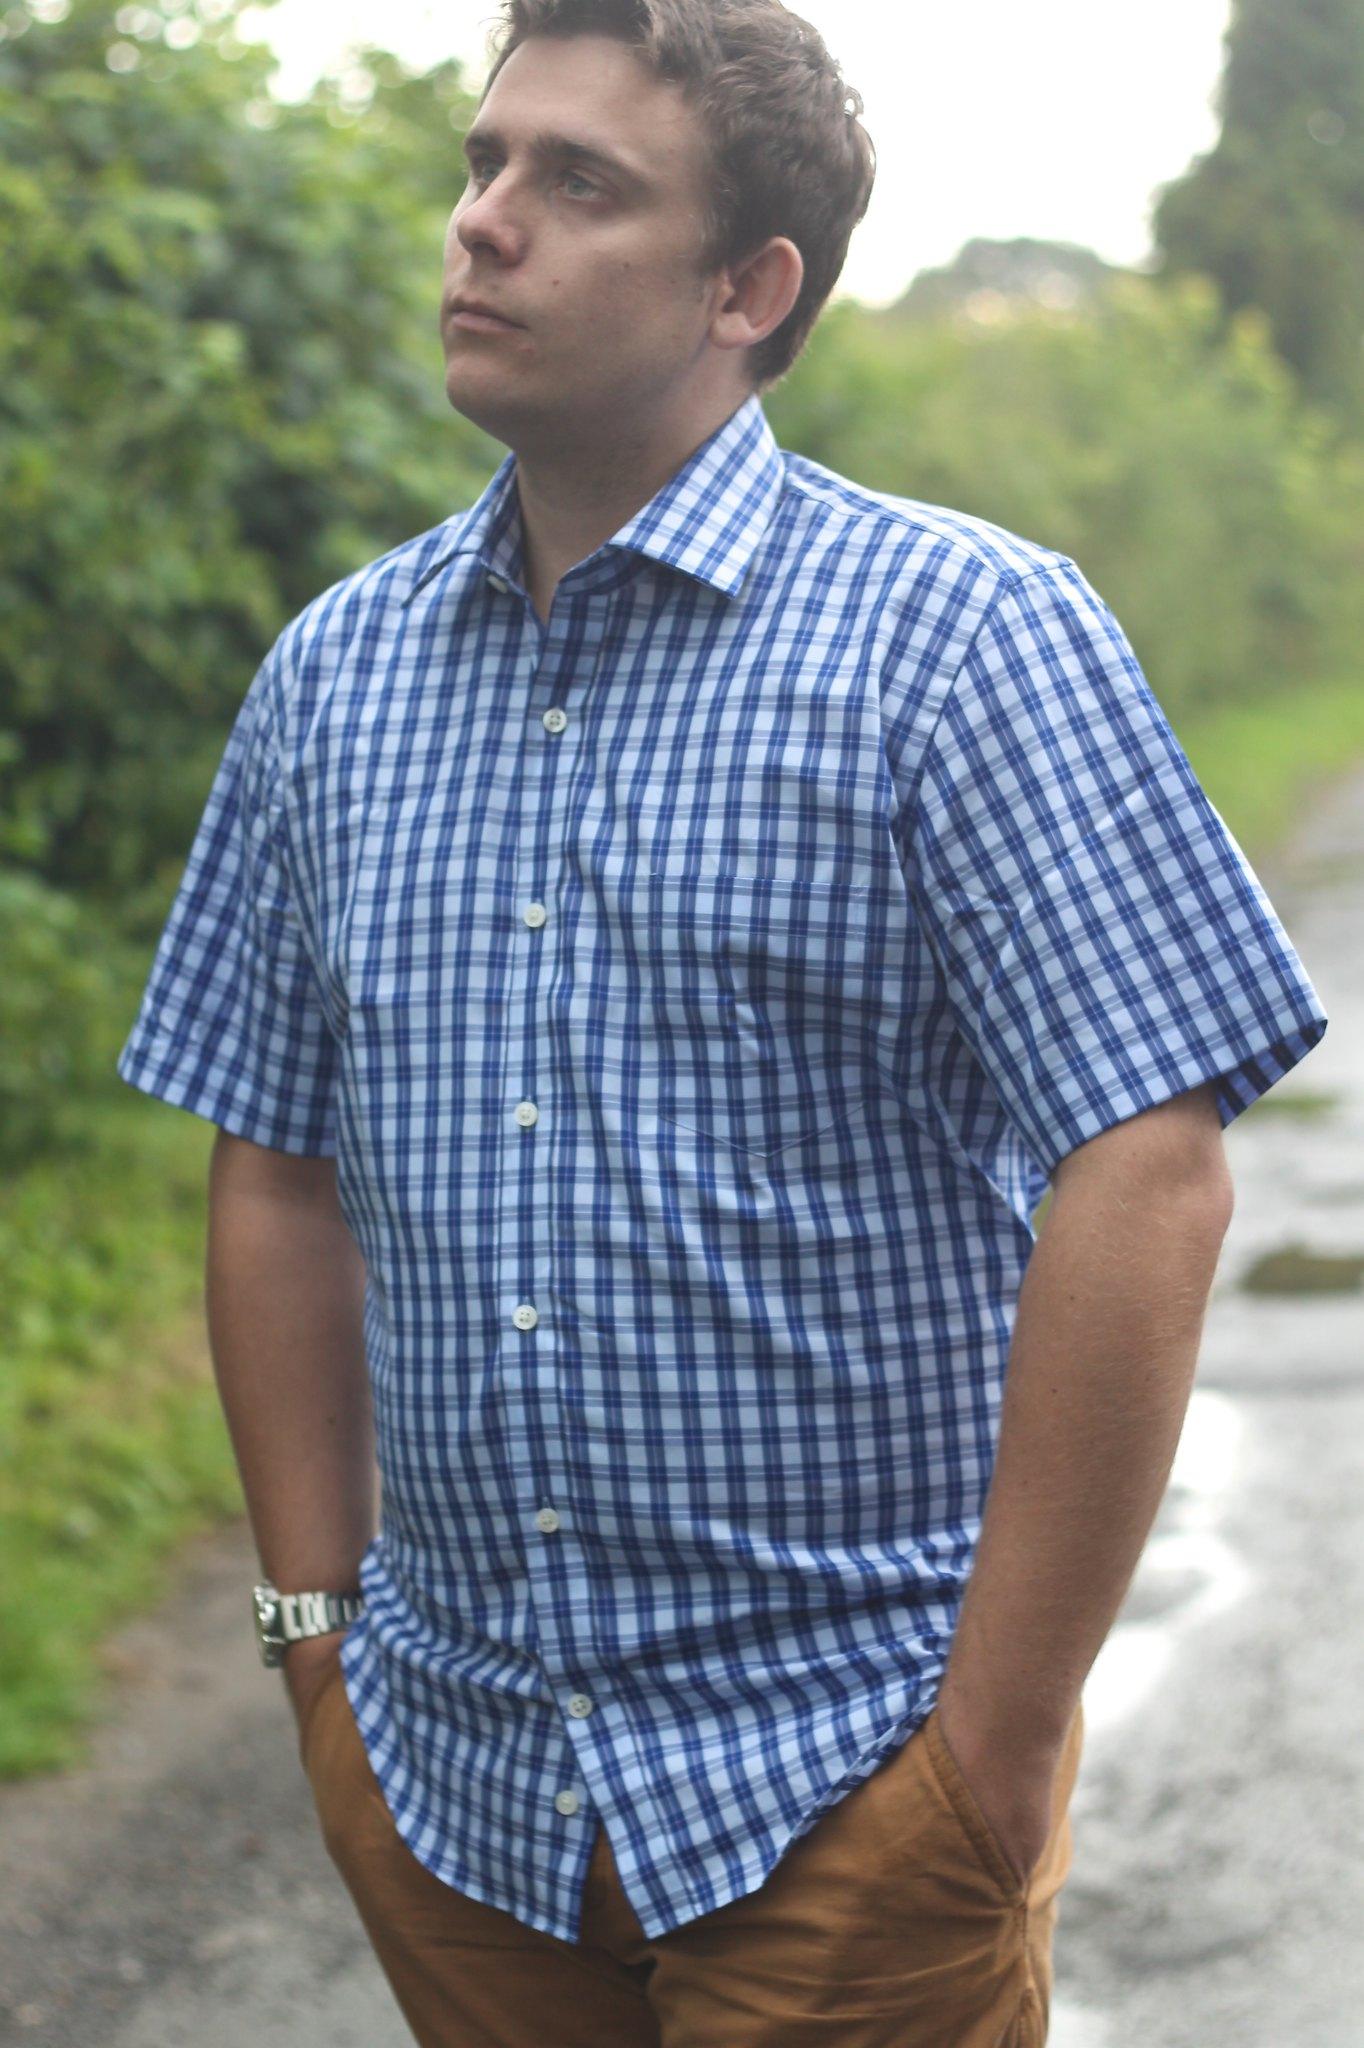 Menswear - Hawes & Curtis shirt